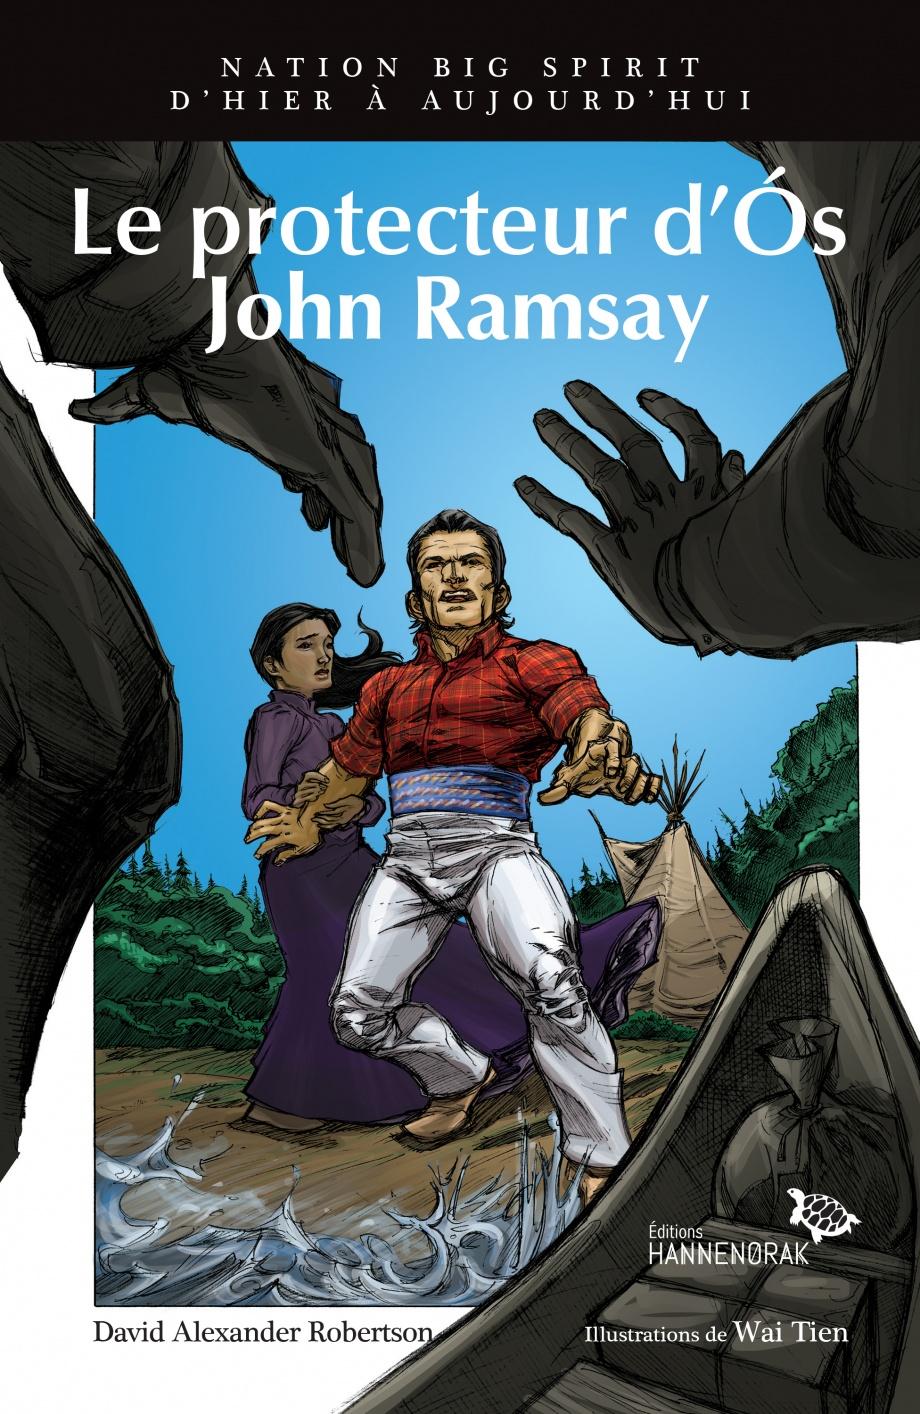 Le protecteur d'Ós : John Ramsay